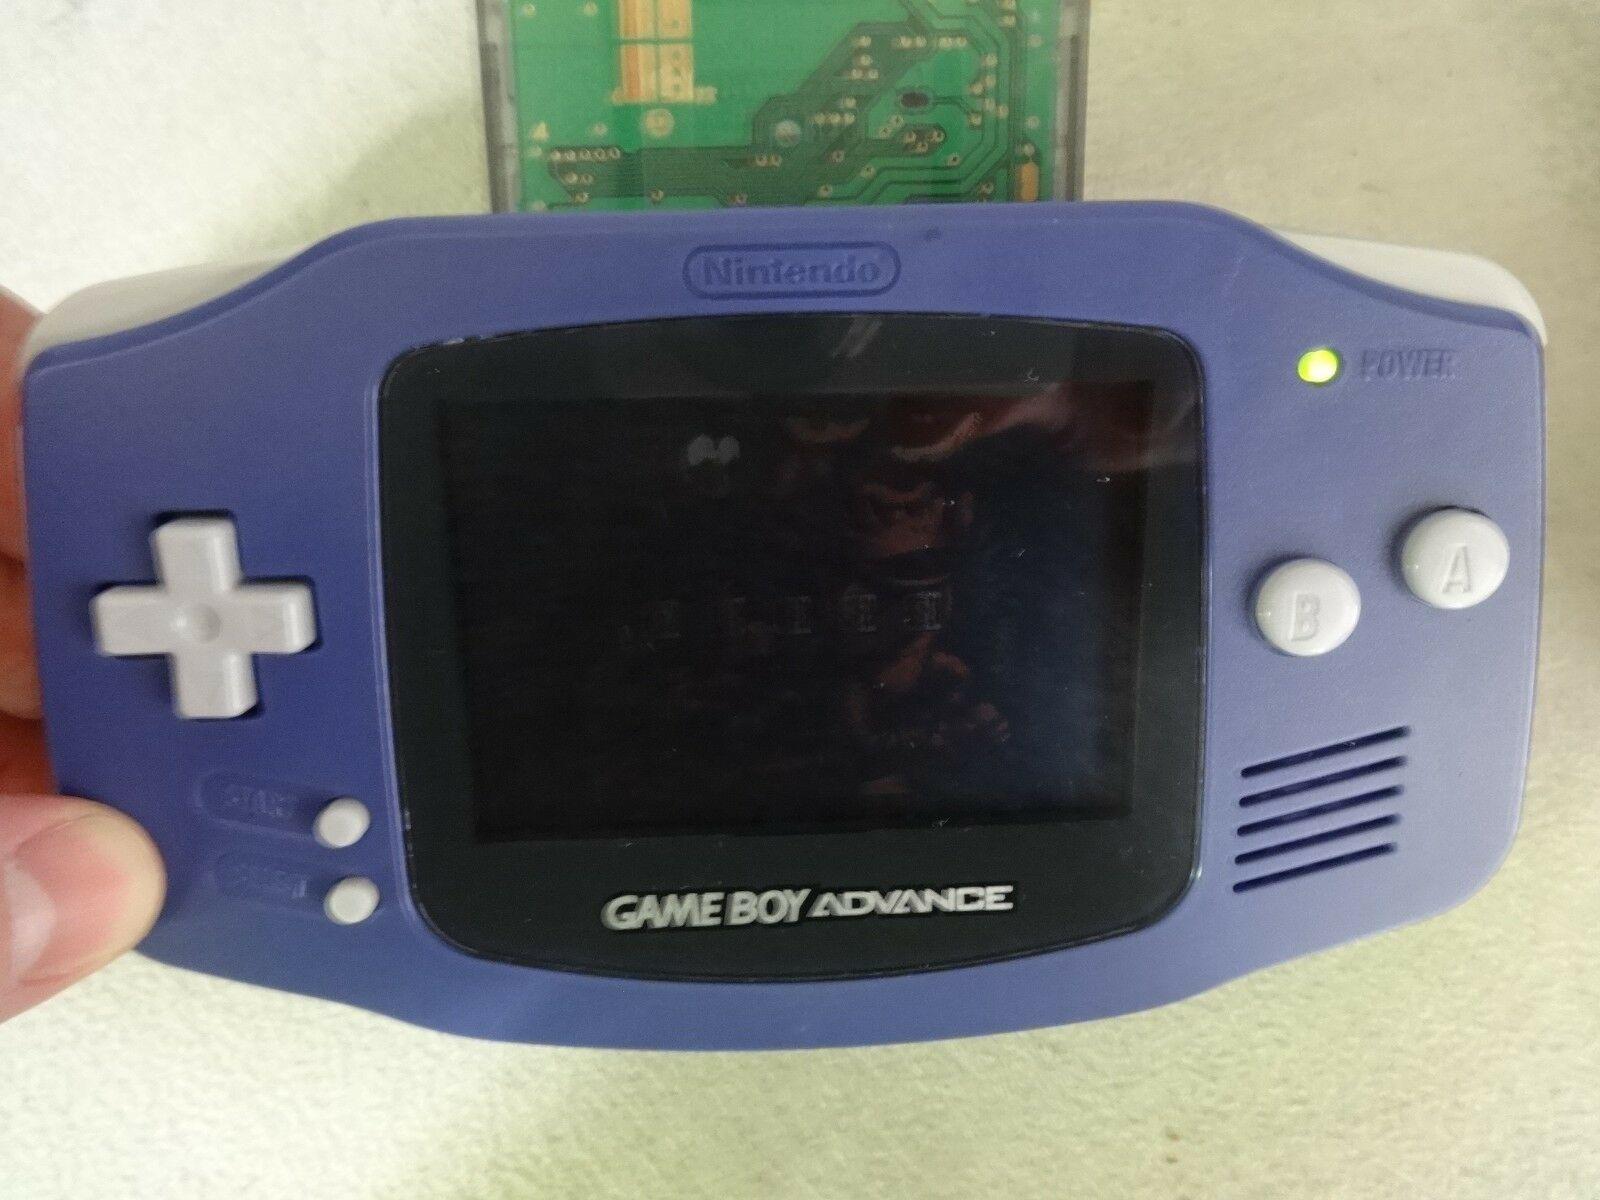 Getestet Voll Nintendo Game Boy Advance - Original - Blau Modell Agb-001 +